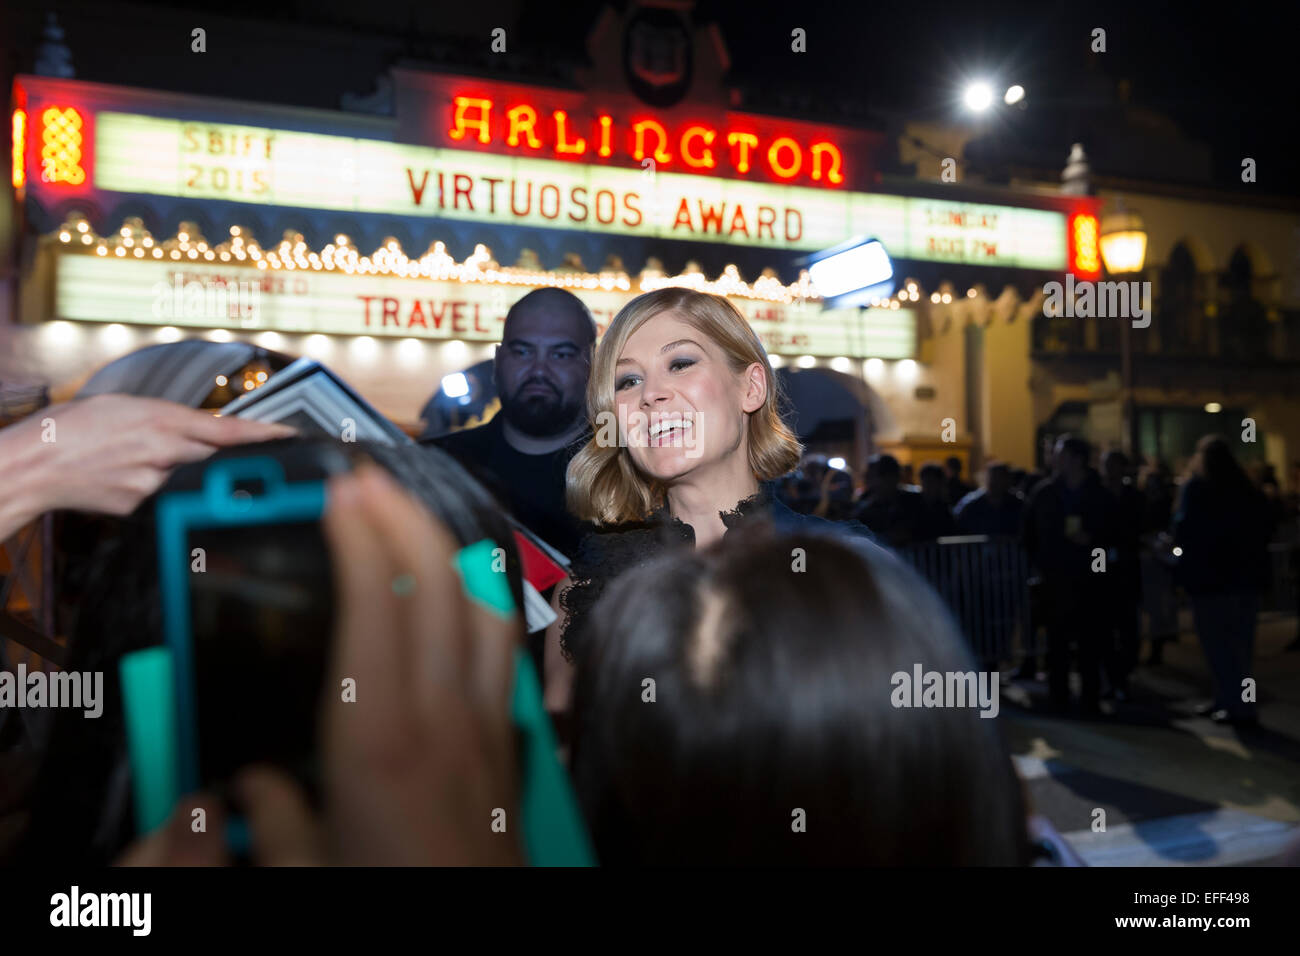 Santa Barbara, California, USA. 1st Feb, 2015. Fans clamor around actress Rosamund Pike hoping for an autograph - Stock Image